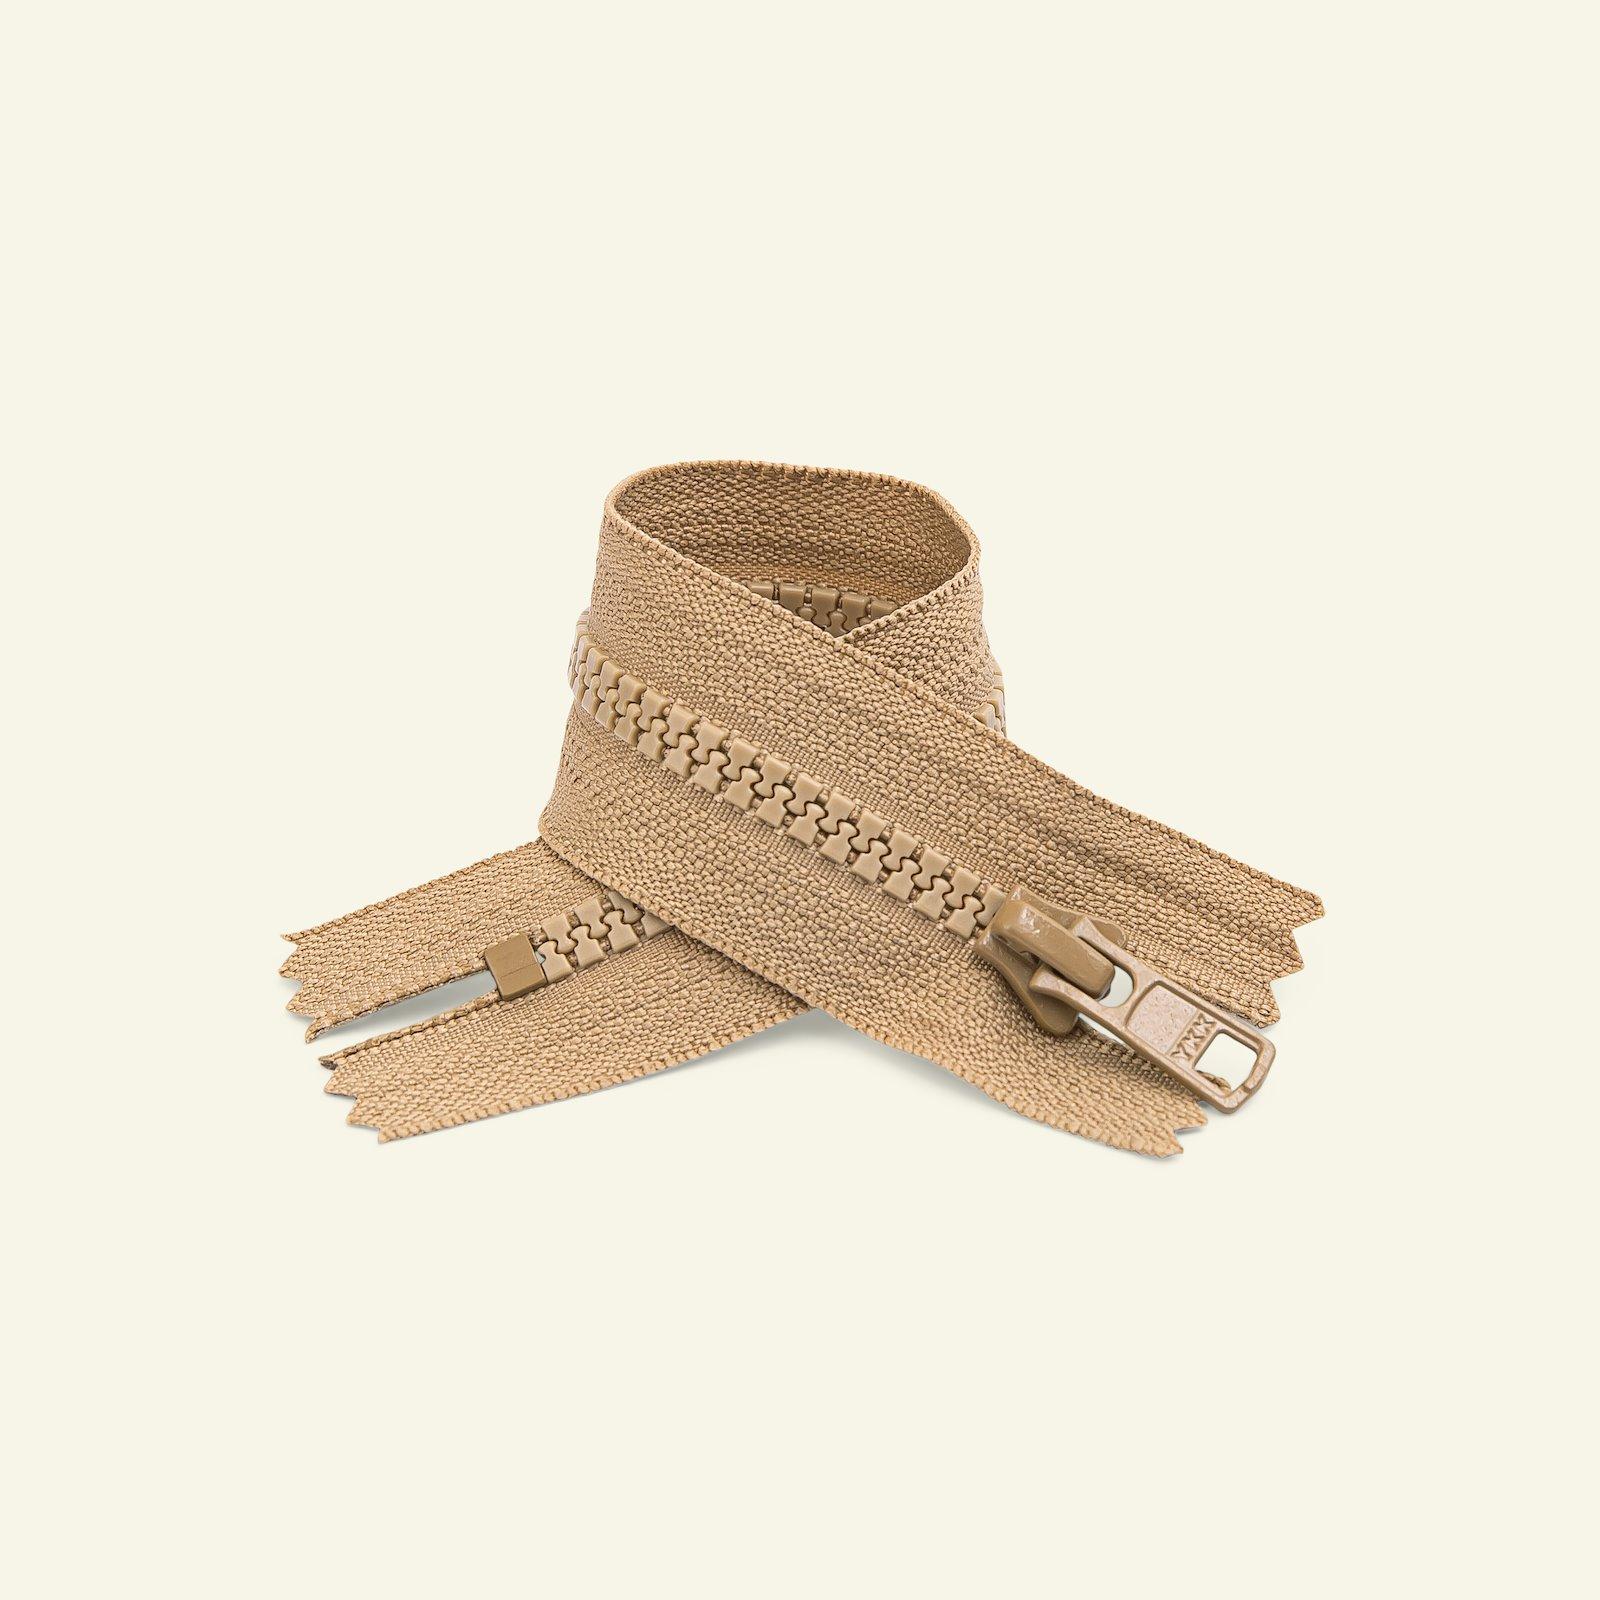 YKK zip 6mm closed end 45cm dark beige x50130_pack